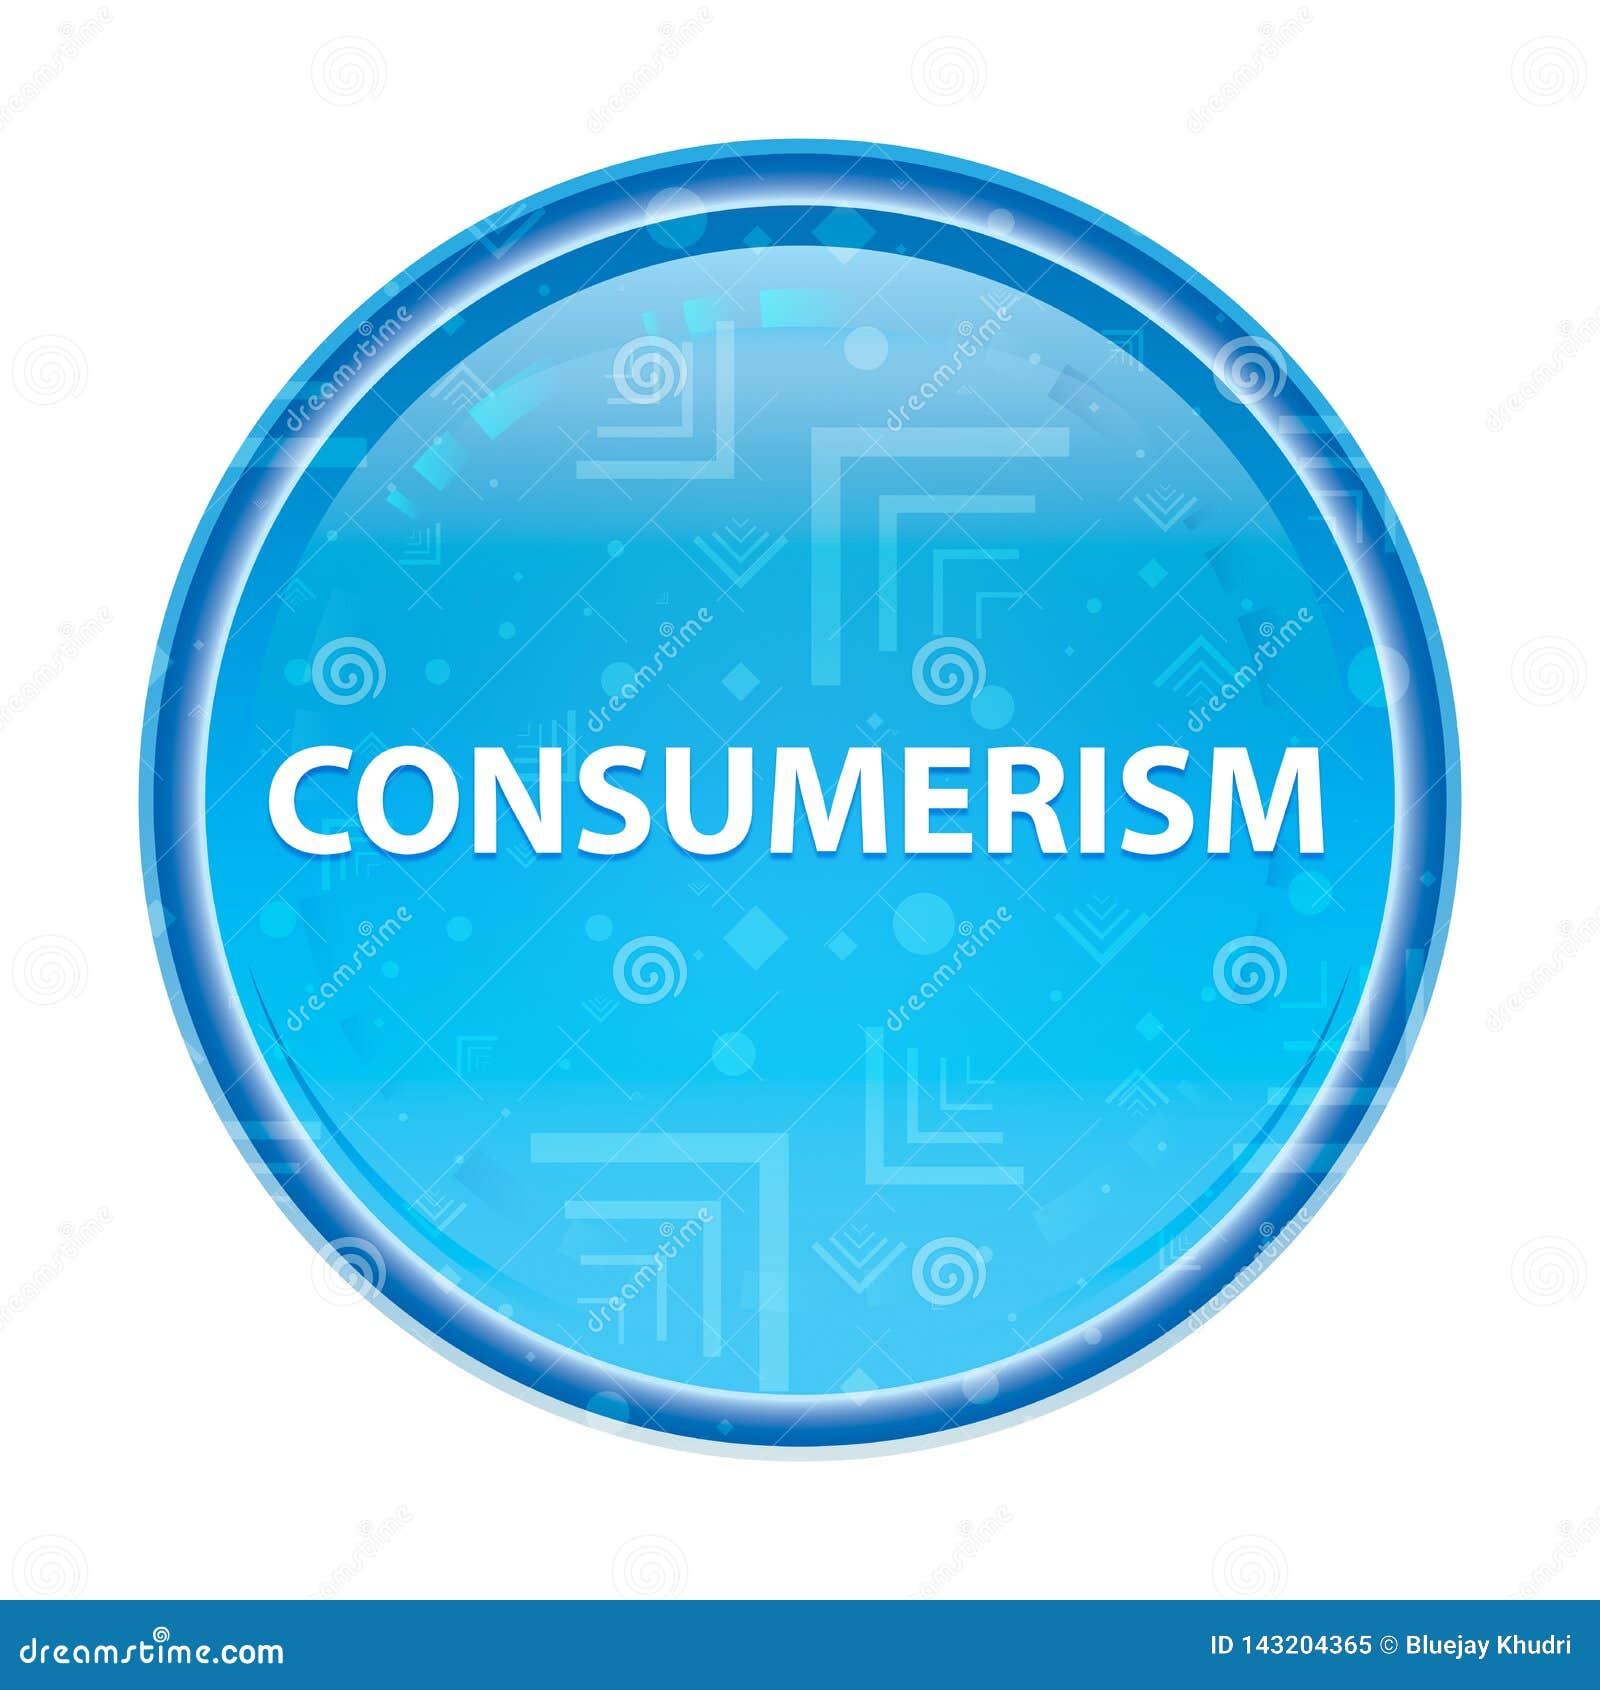 Consumerism floral blue round button